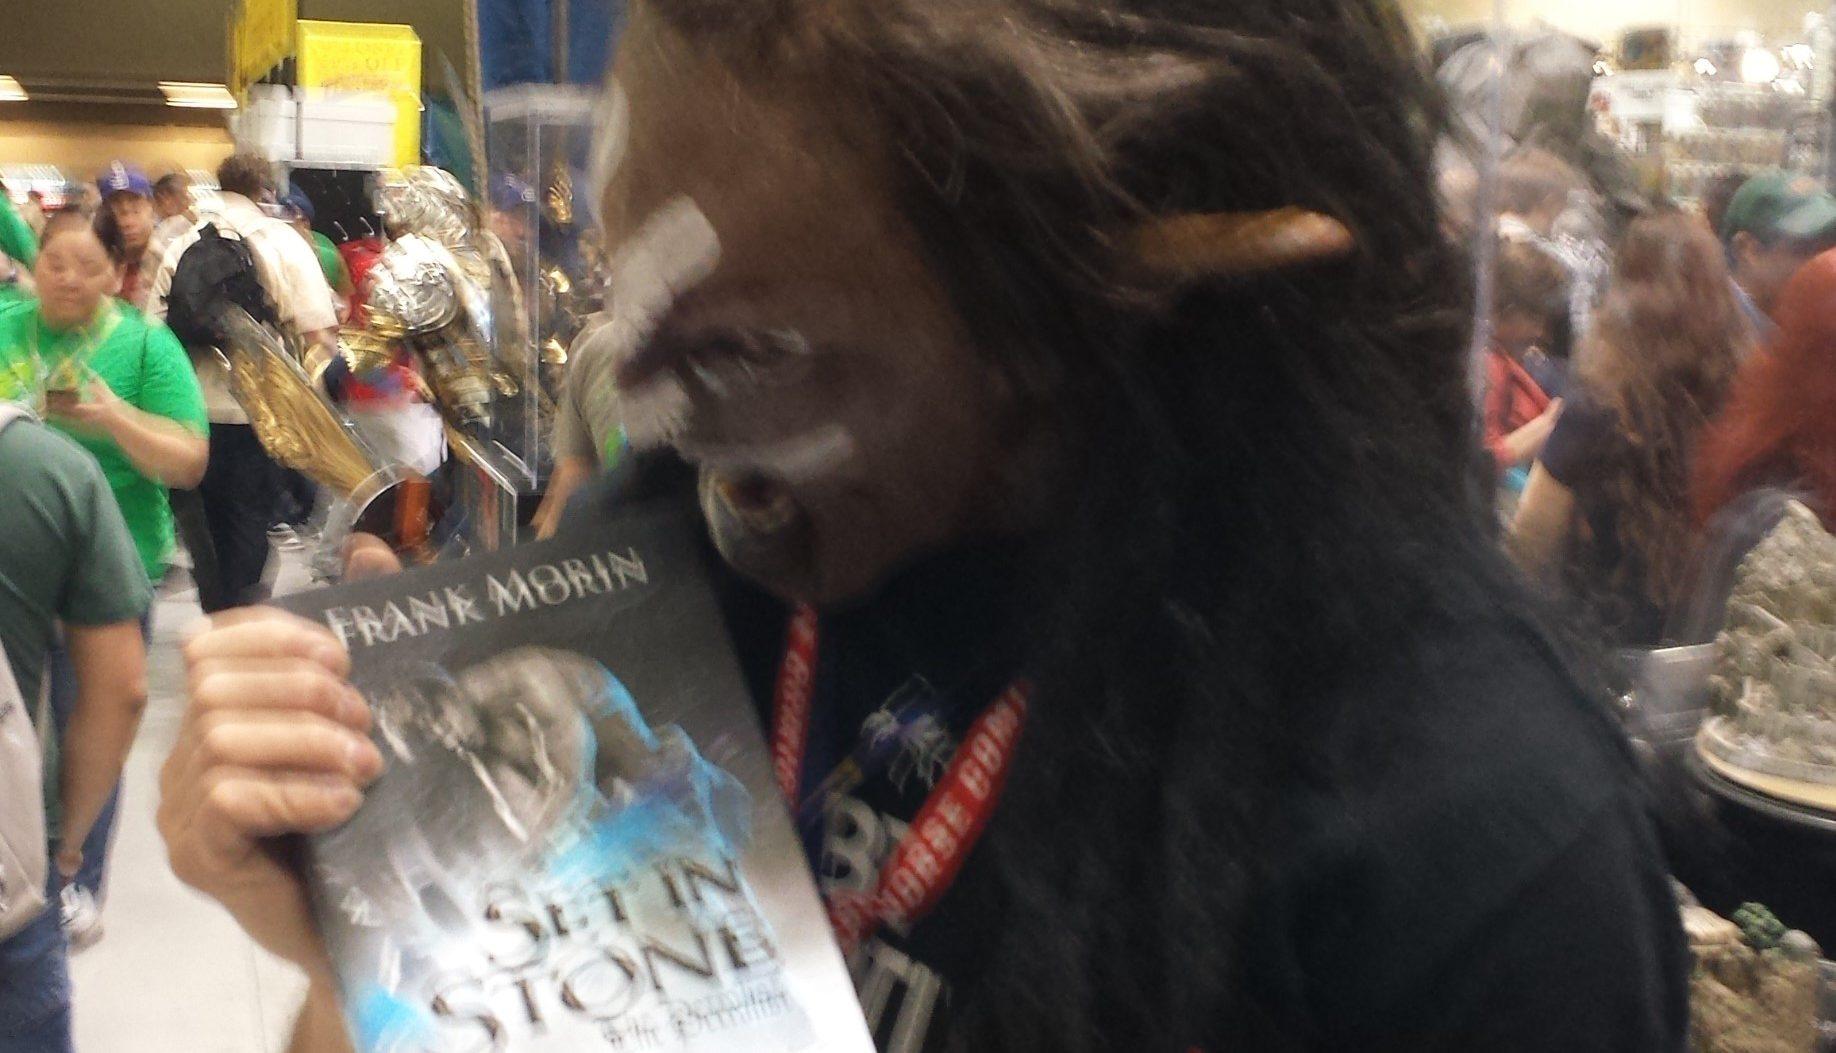 Uruk'hai eating a book